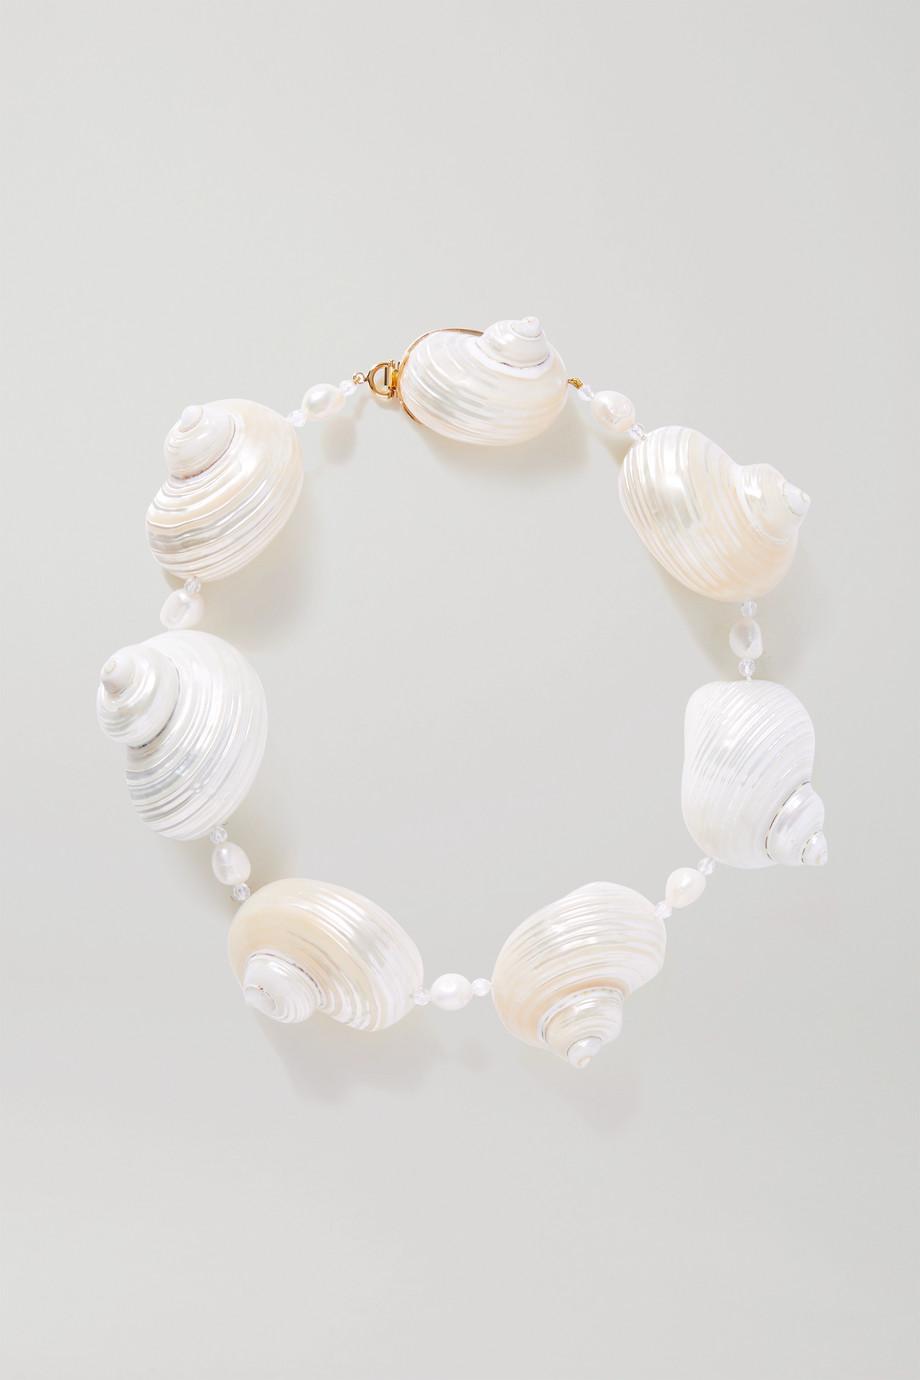 Prada Gold vermeil multi-stone necklace